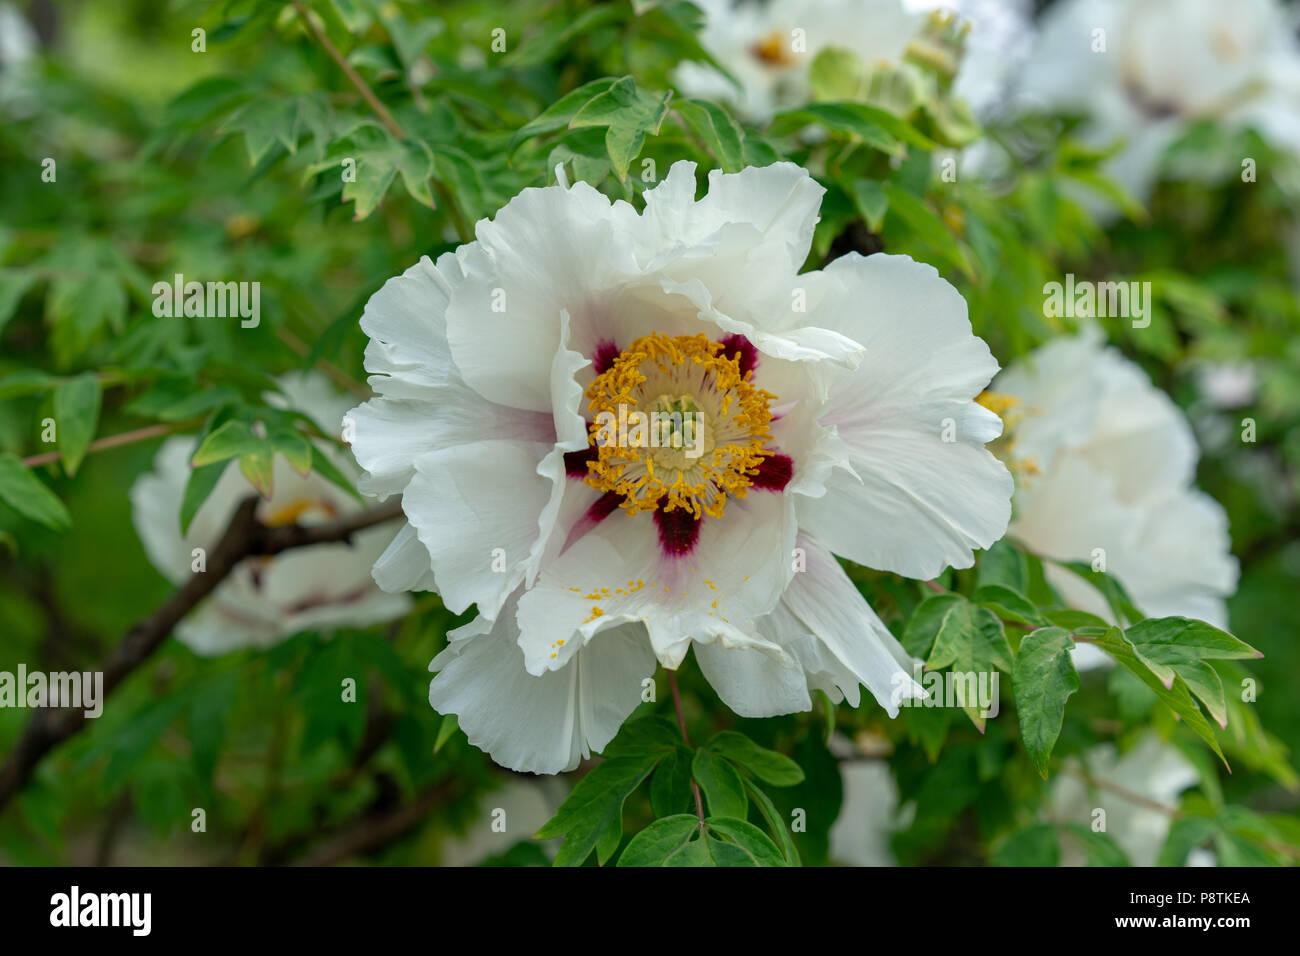 Blooming tree peony big white peonies bloom in the spring season blooming tree peony big white peonies bloom in the spring season known as paeonia rockii paeoniaceae from china mightylinksfo